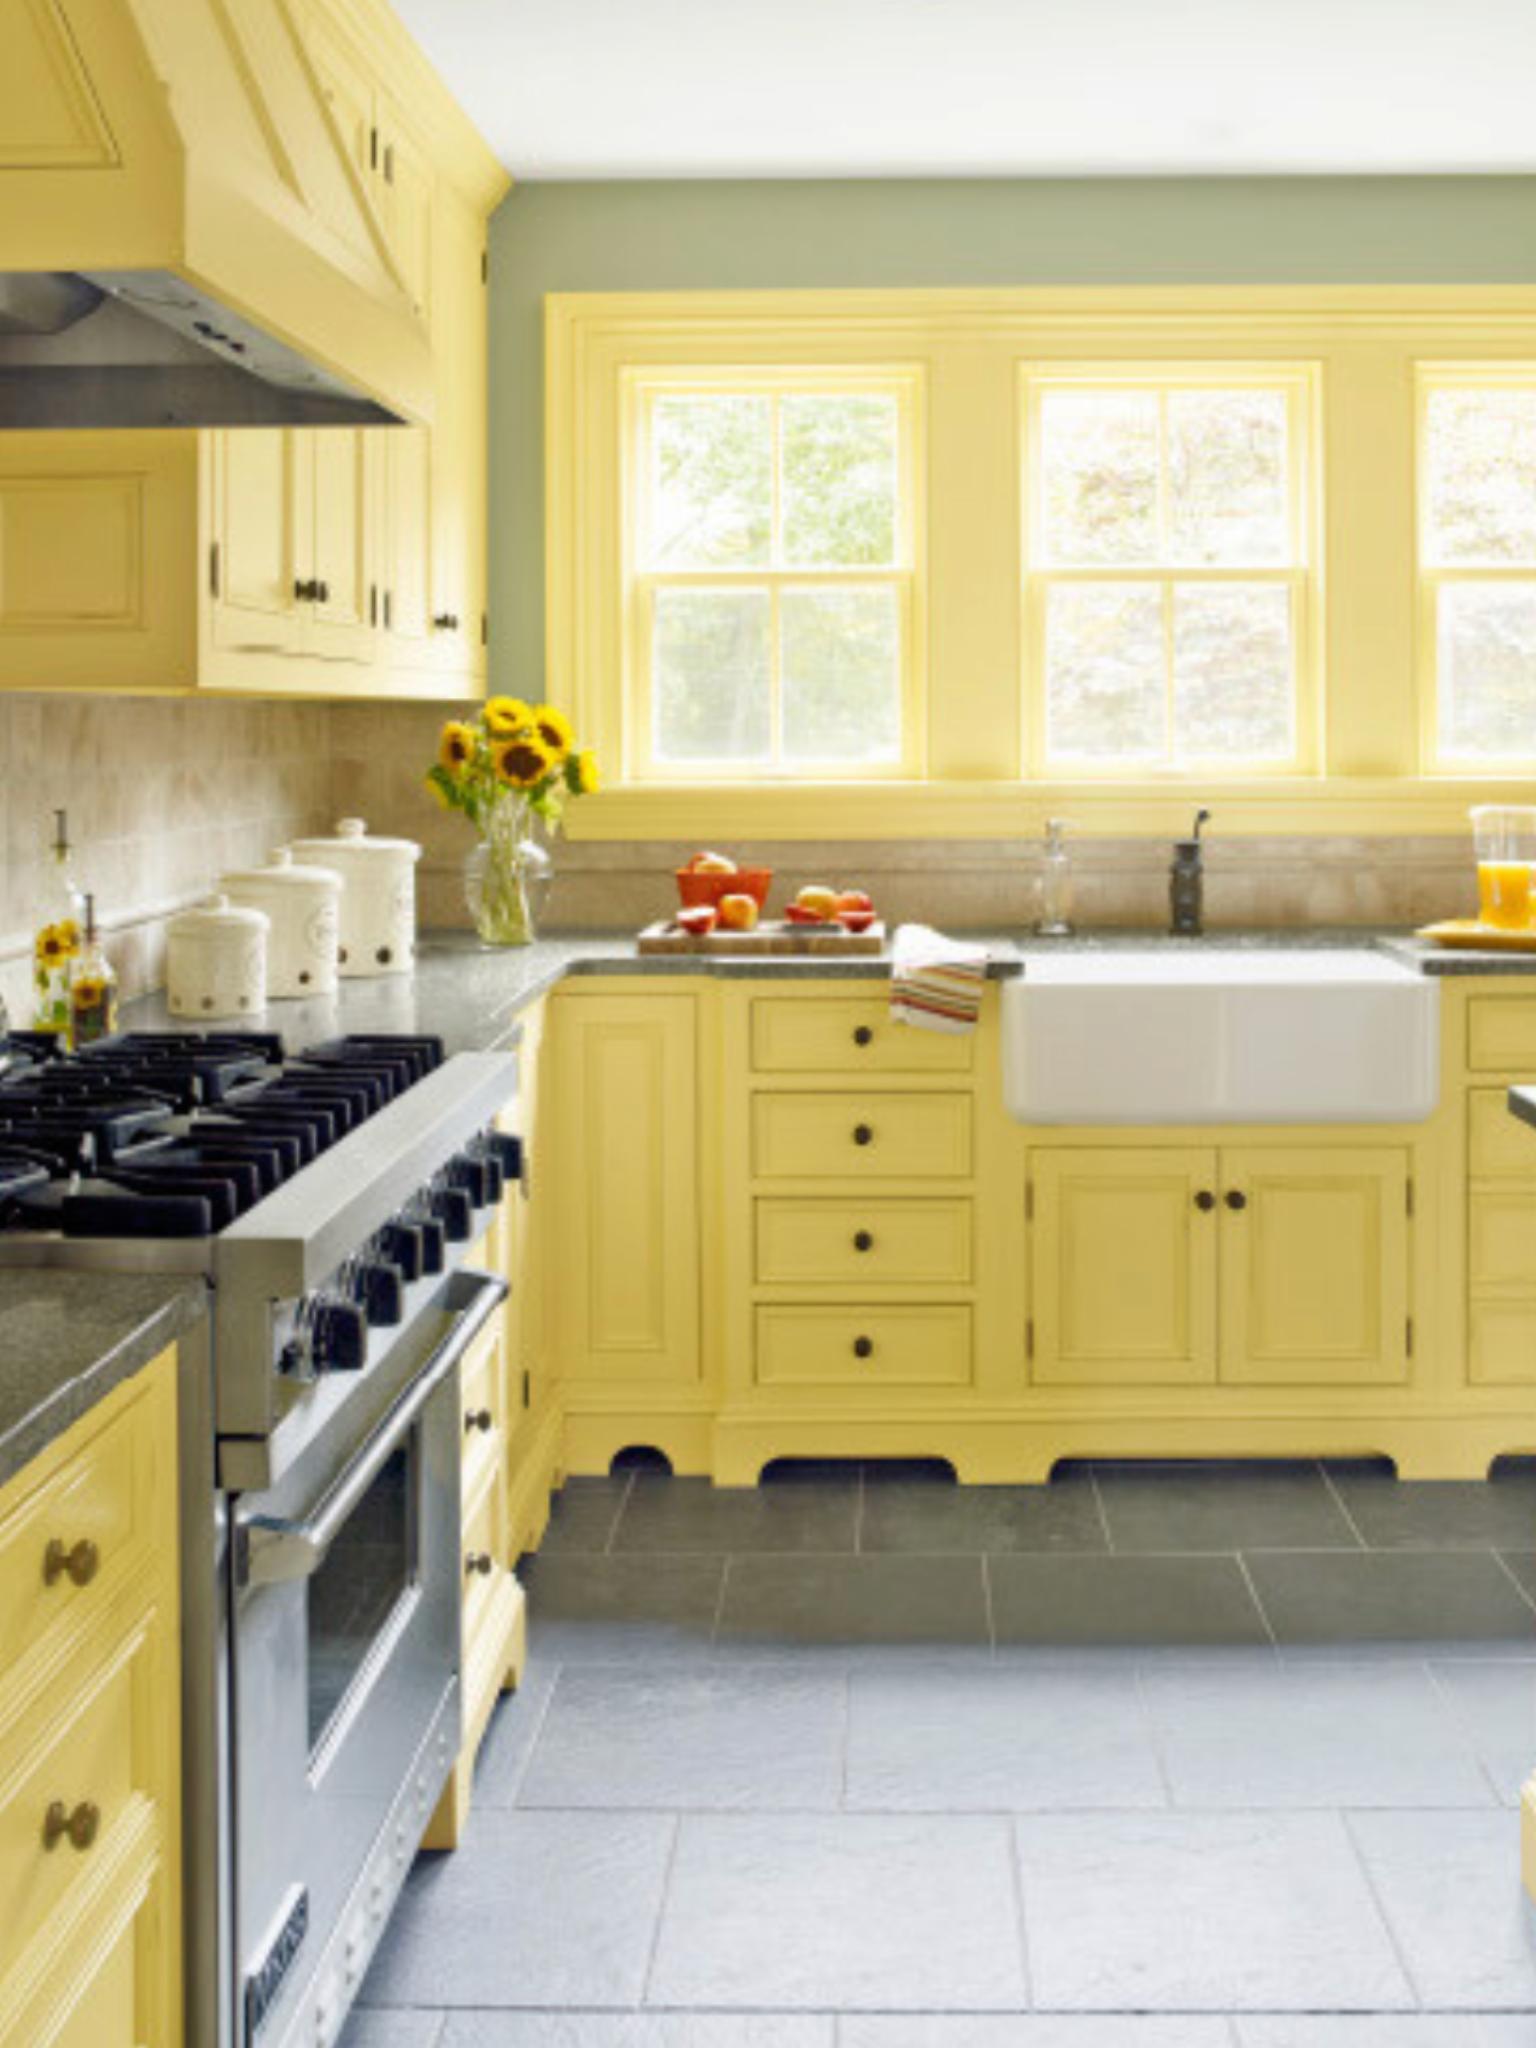 like the yellow yellow kitchen cabinets kitchen cabinets kitchen design on kitchen yellow id=83681